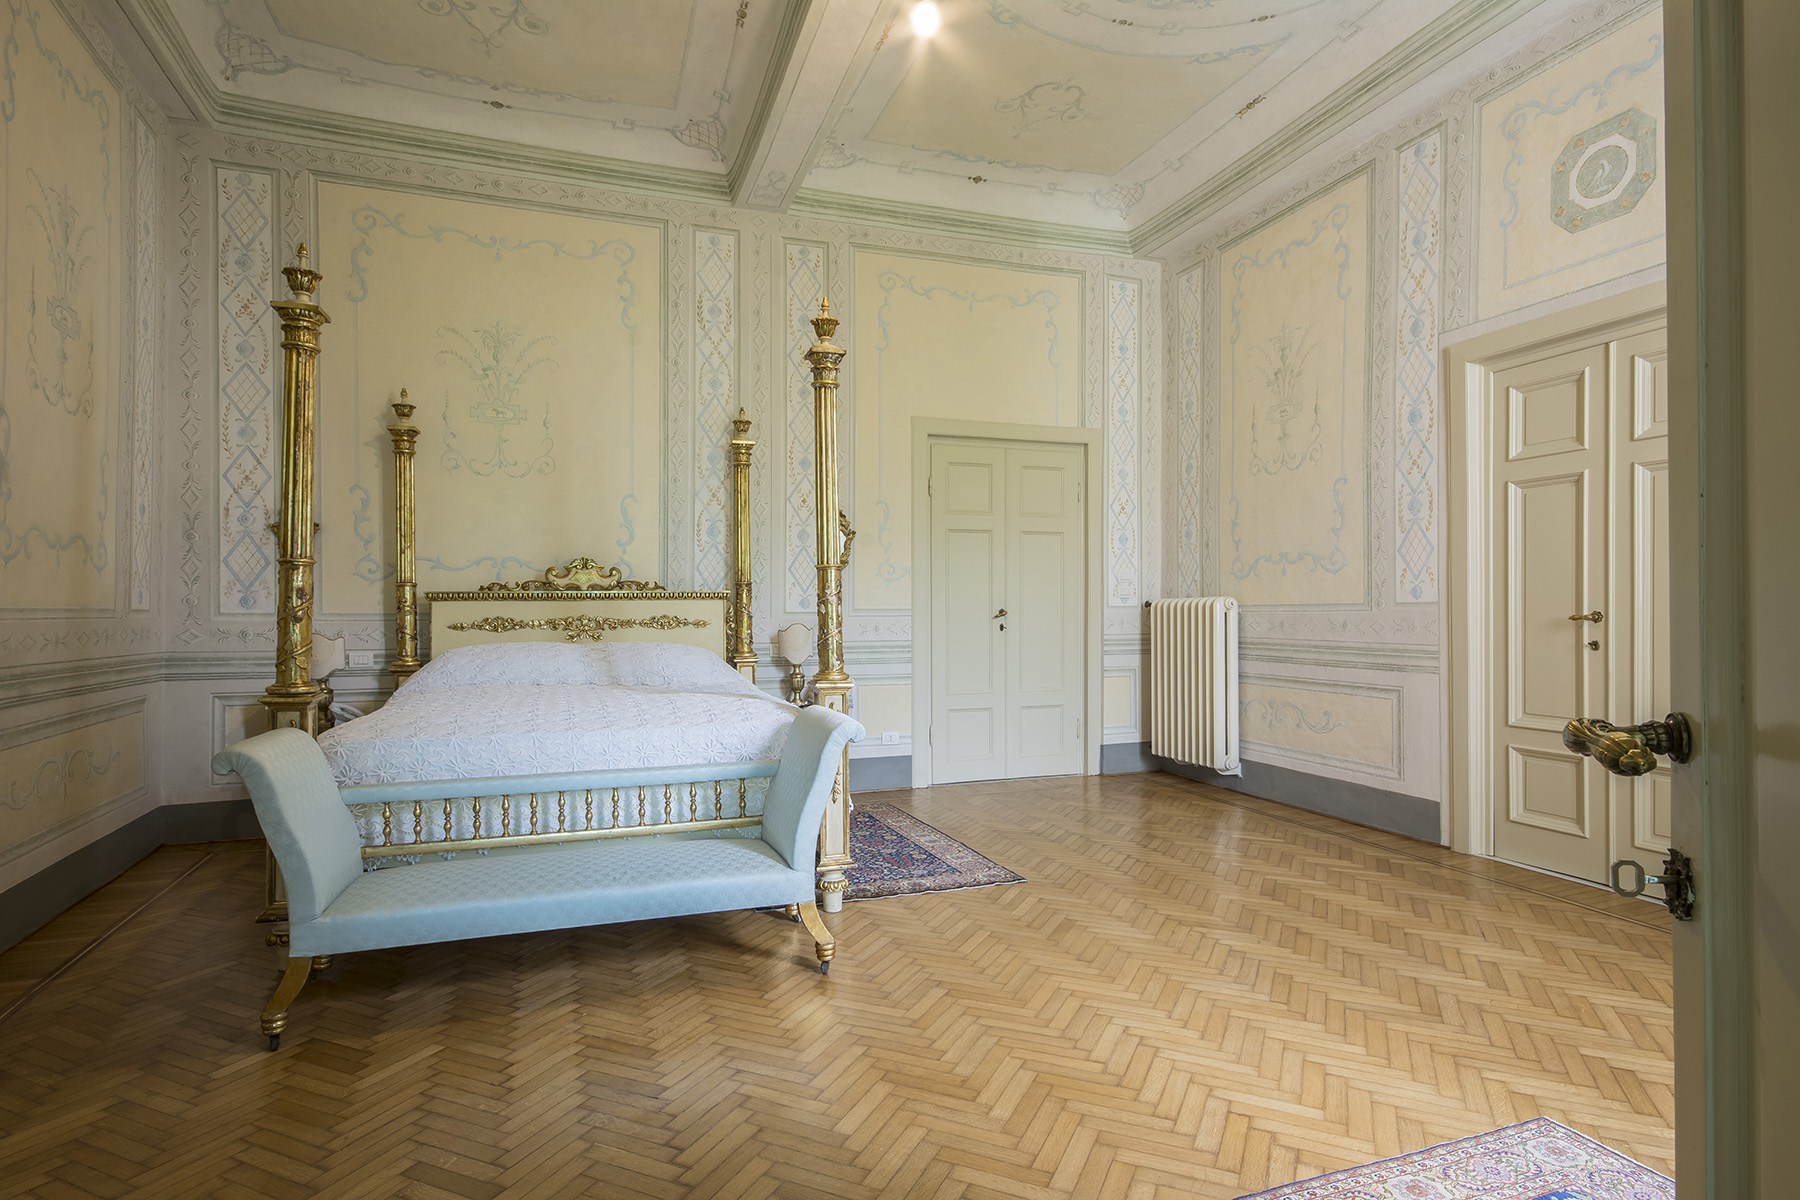 Villa in Vendita a Lucca: 5 locali, 1200 mq - Foto 10